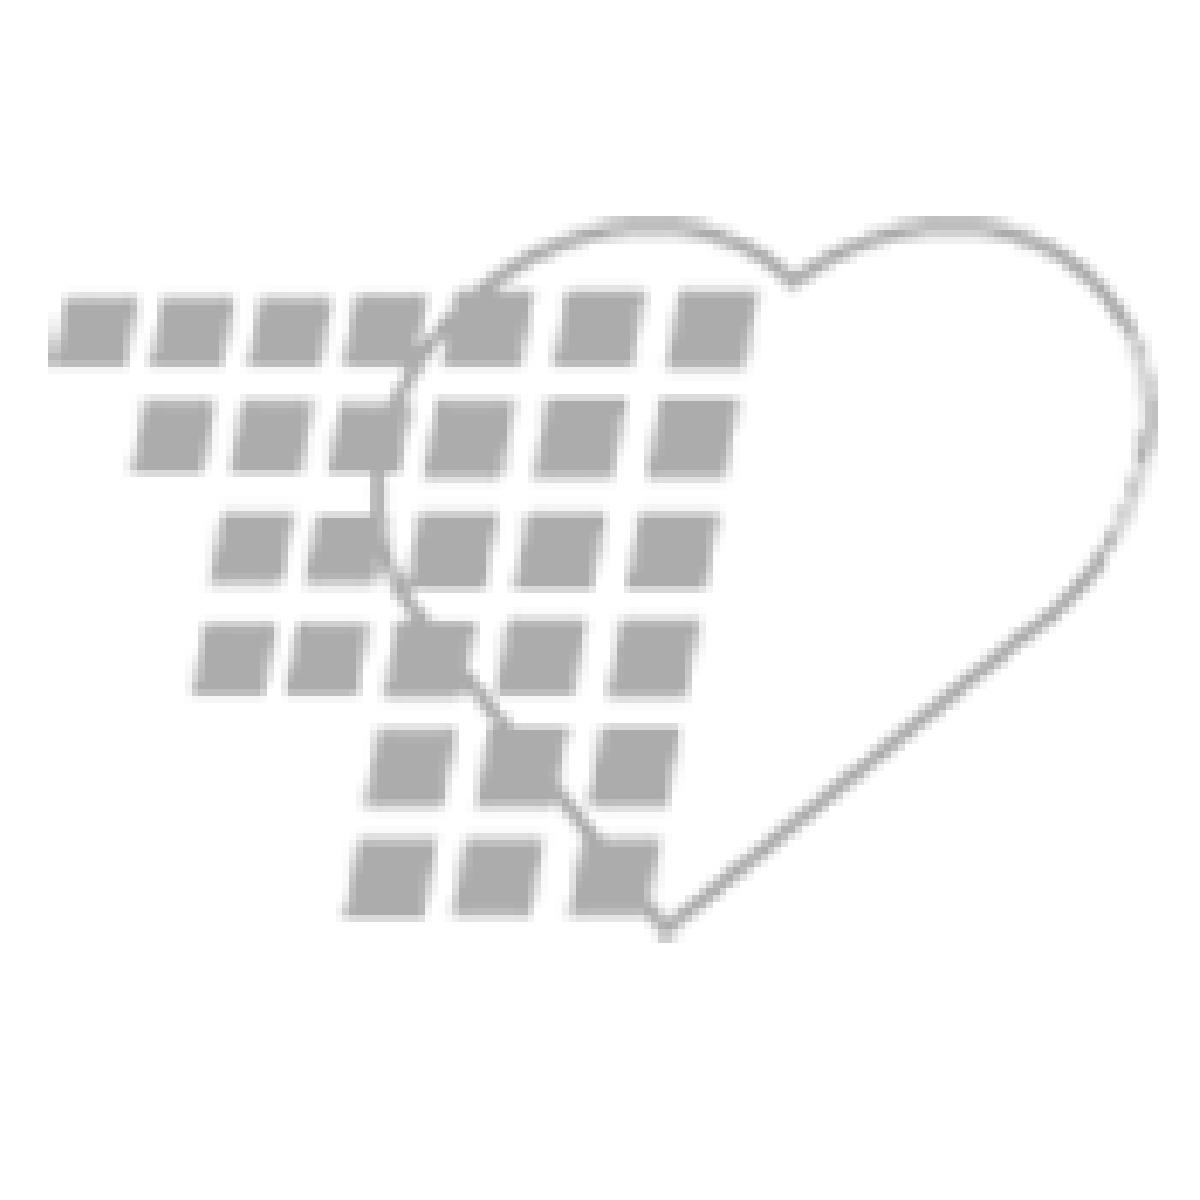 06-93-1060-250ML - Demo Dose® 0.45% NaCl IV Fluids 250mL